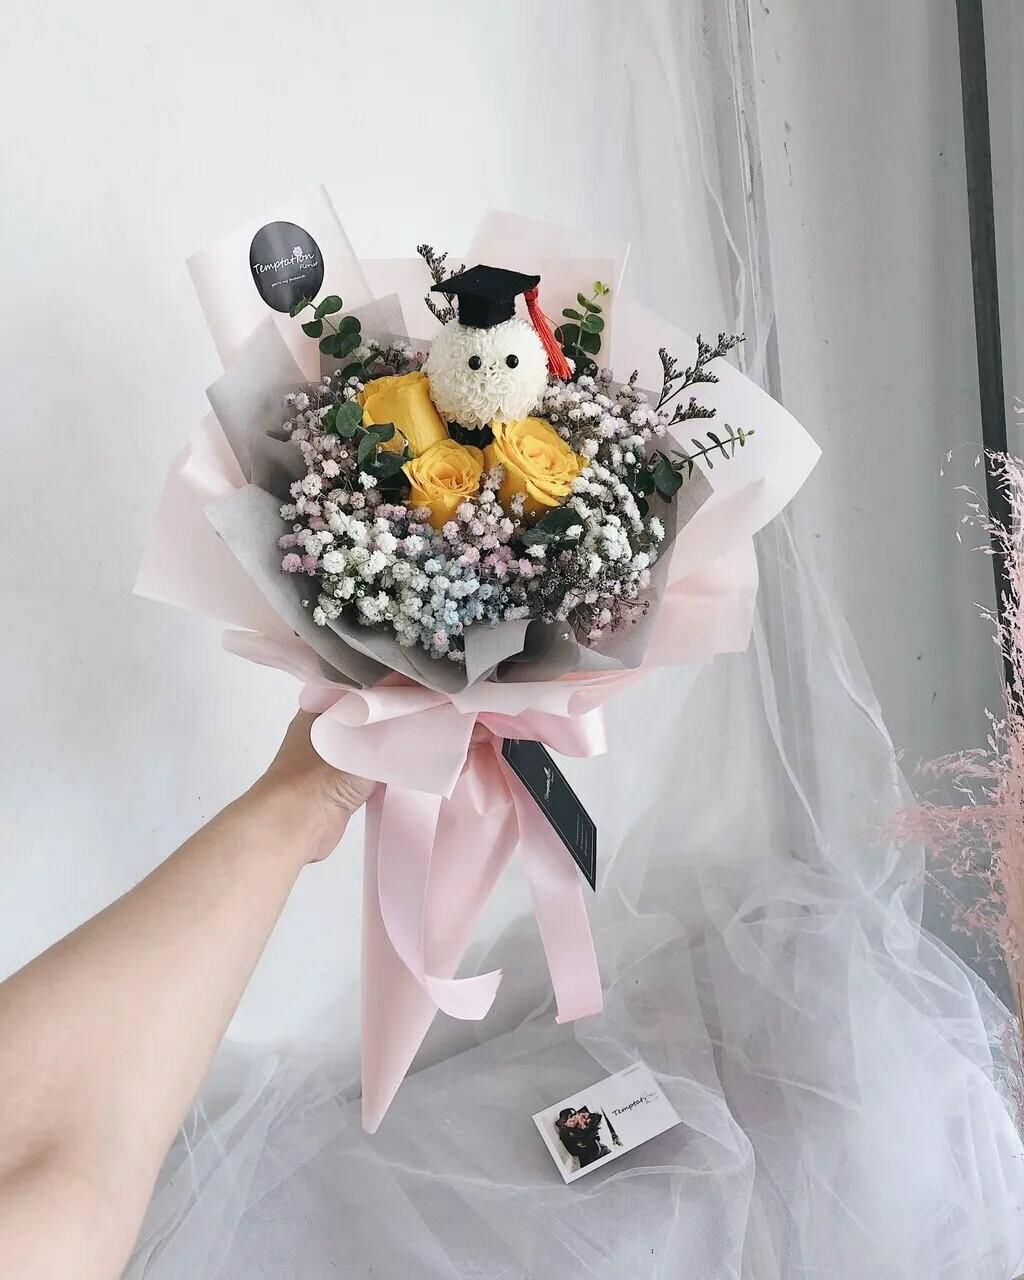 Lil Sunny (By: Temptation Florist from Seremban)